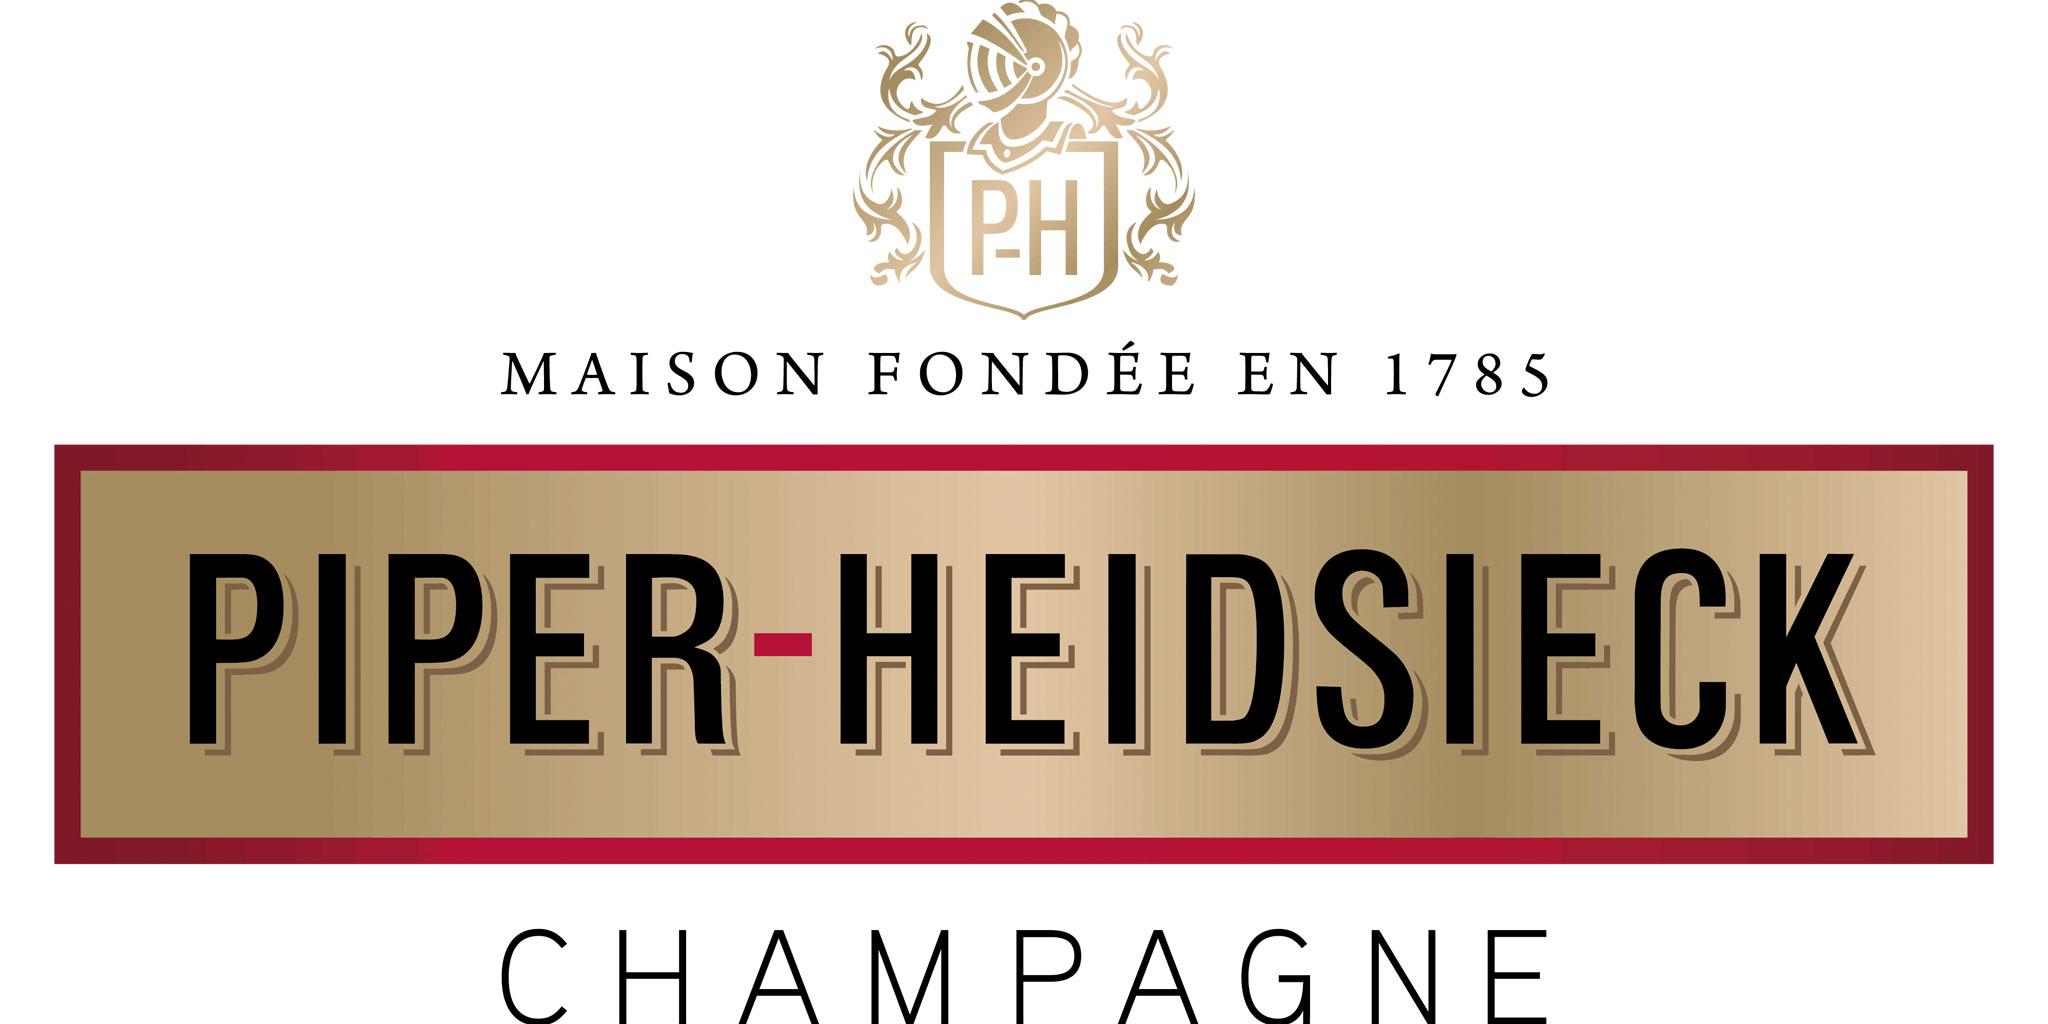 Piper-Heidsieck champagne logo